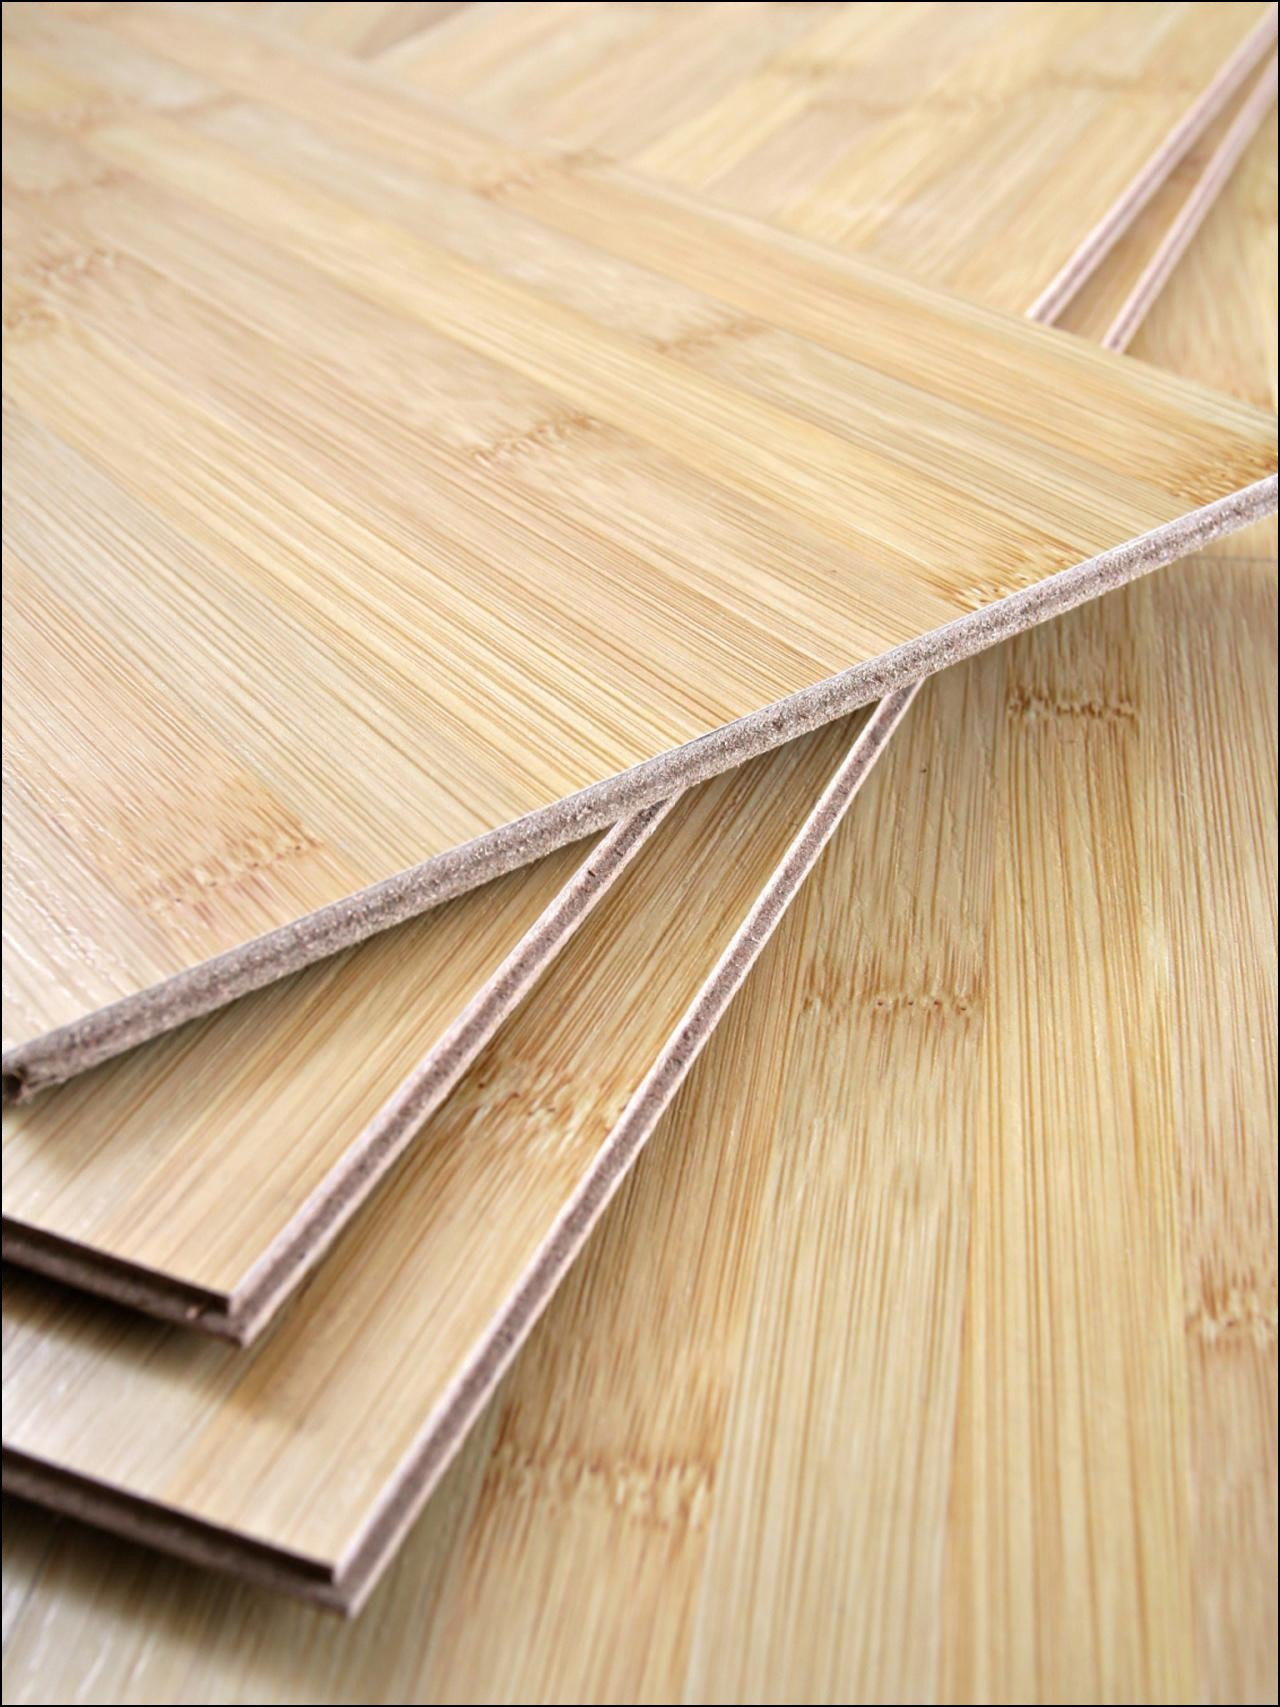 walnut hardwood flooring home depot of home depot queen creek flooring ideas for home depot solid bamboo flooring images hardwood floor design wood flooring cost strand bamboo flooring of